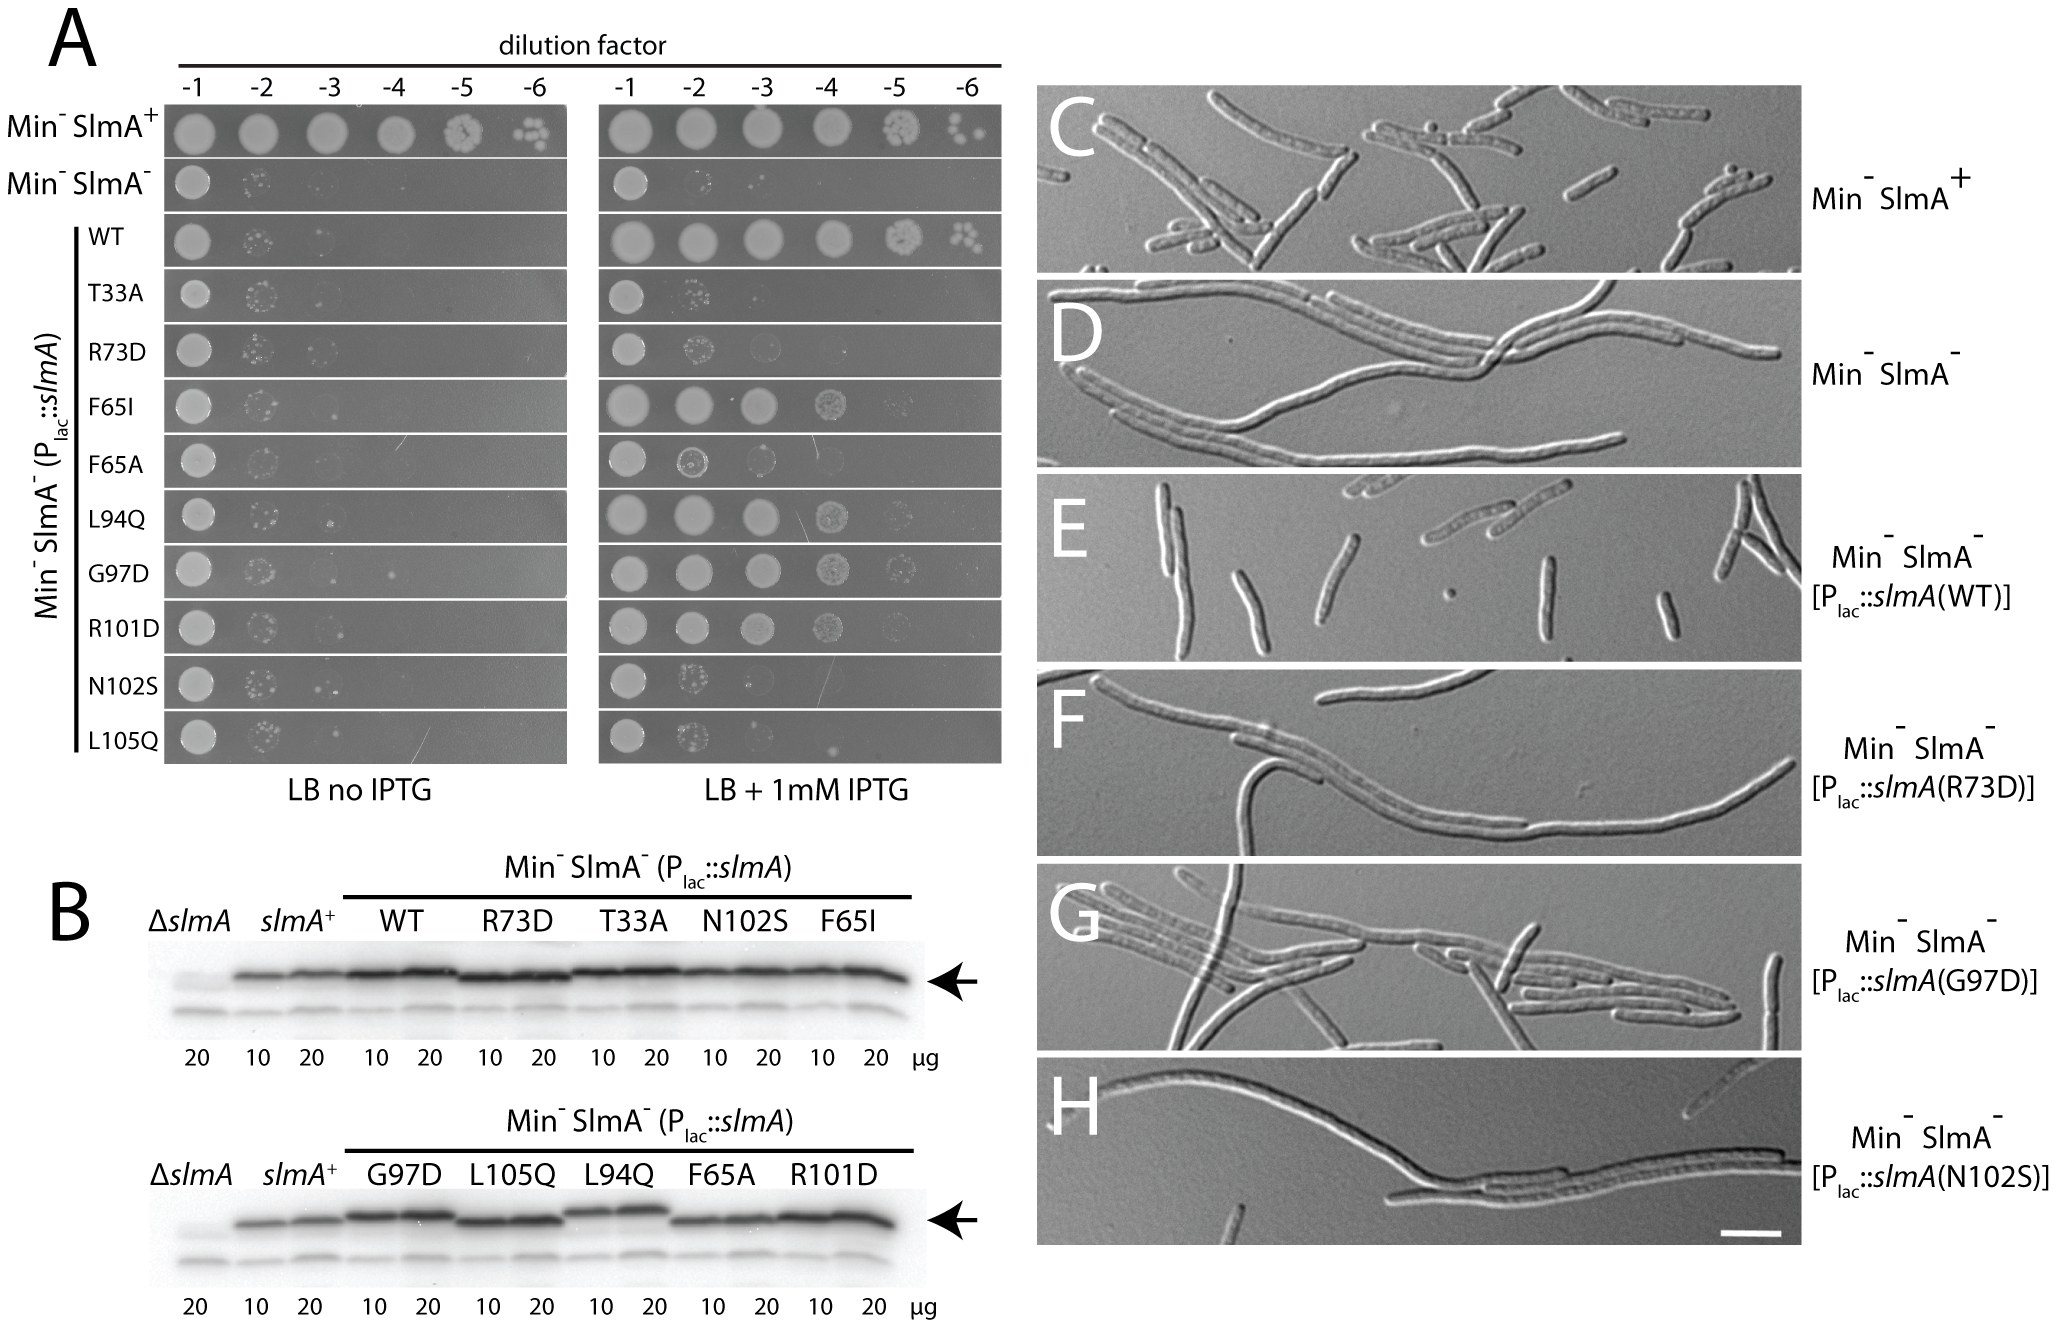 Nucleoid occlusion activity of the SlmA variants.